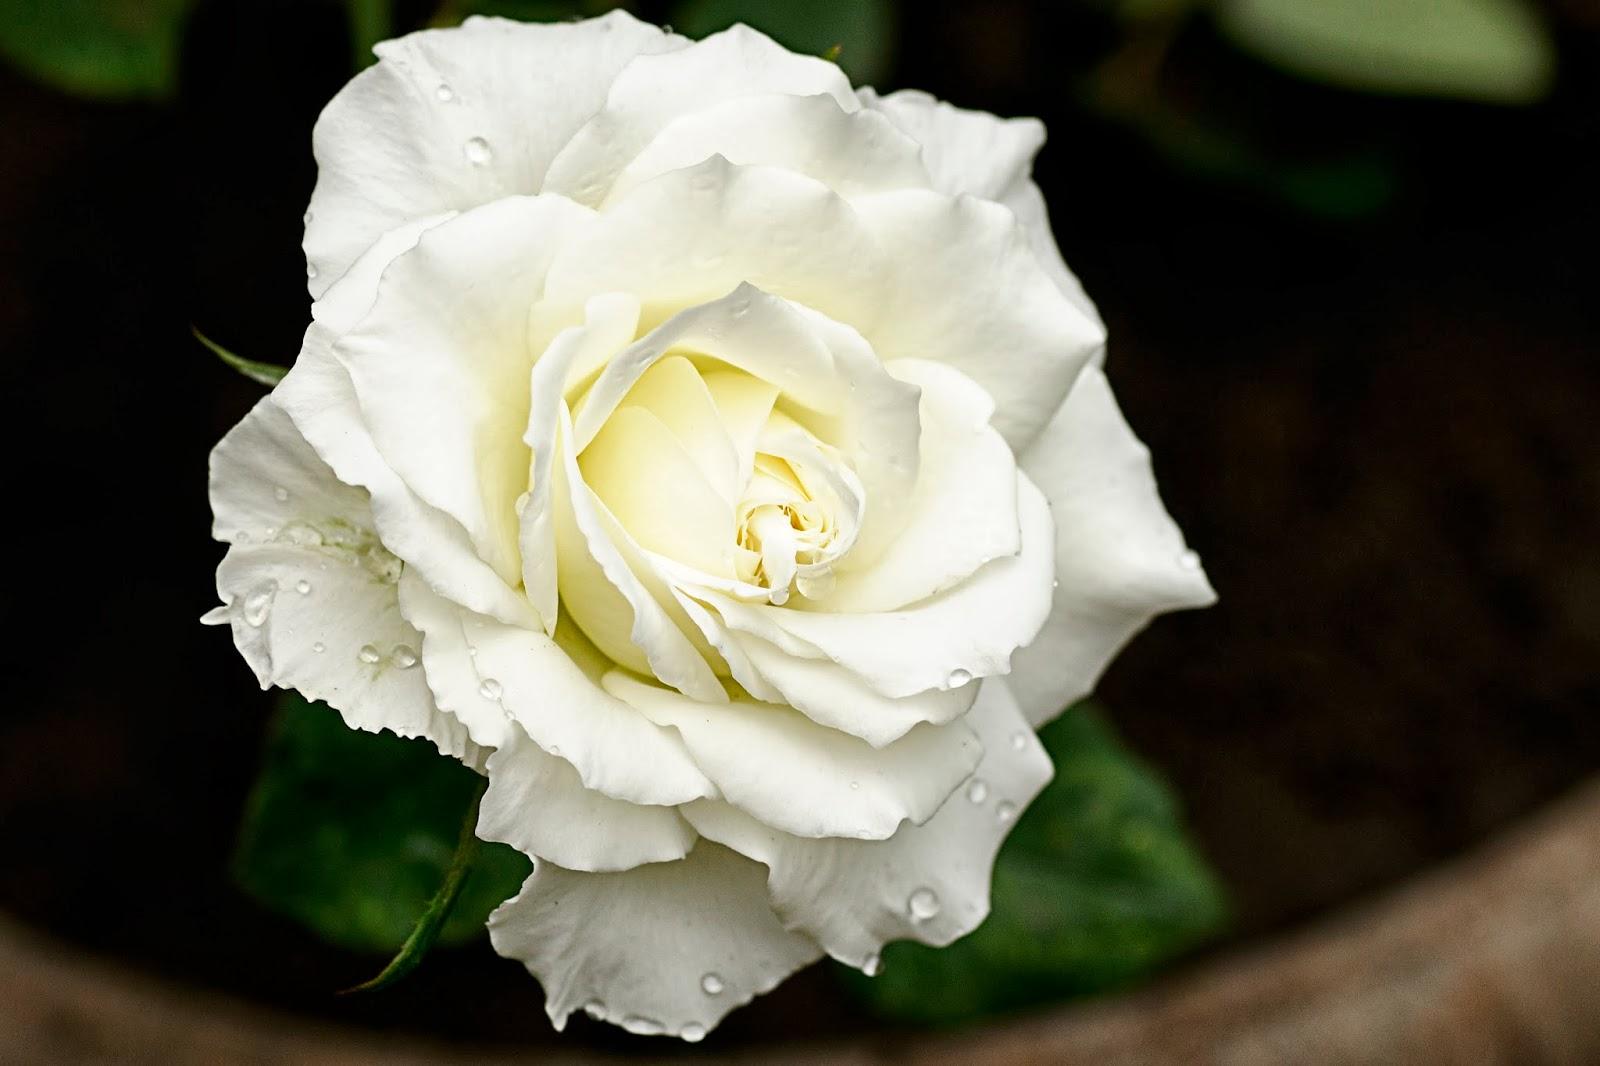 white rose flowers - photo #11